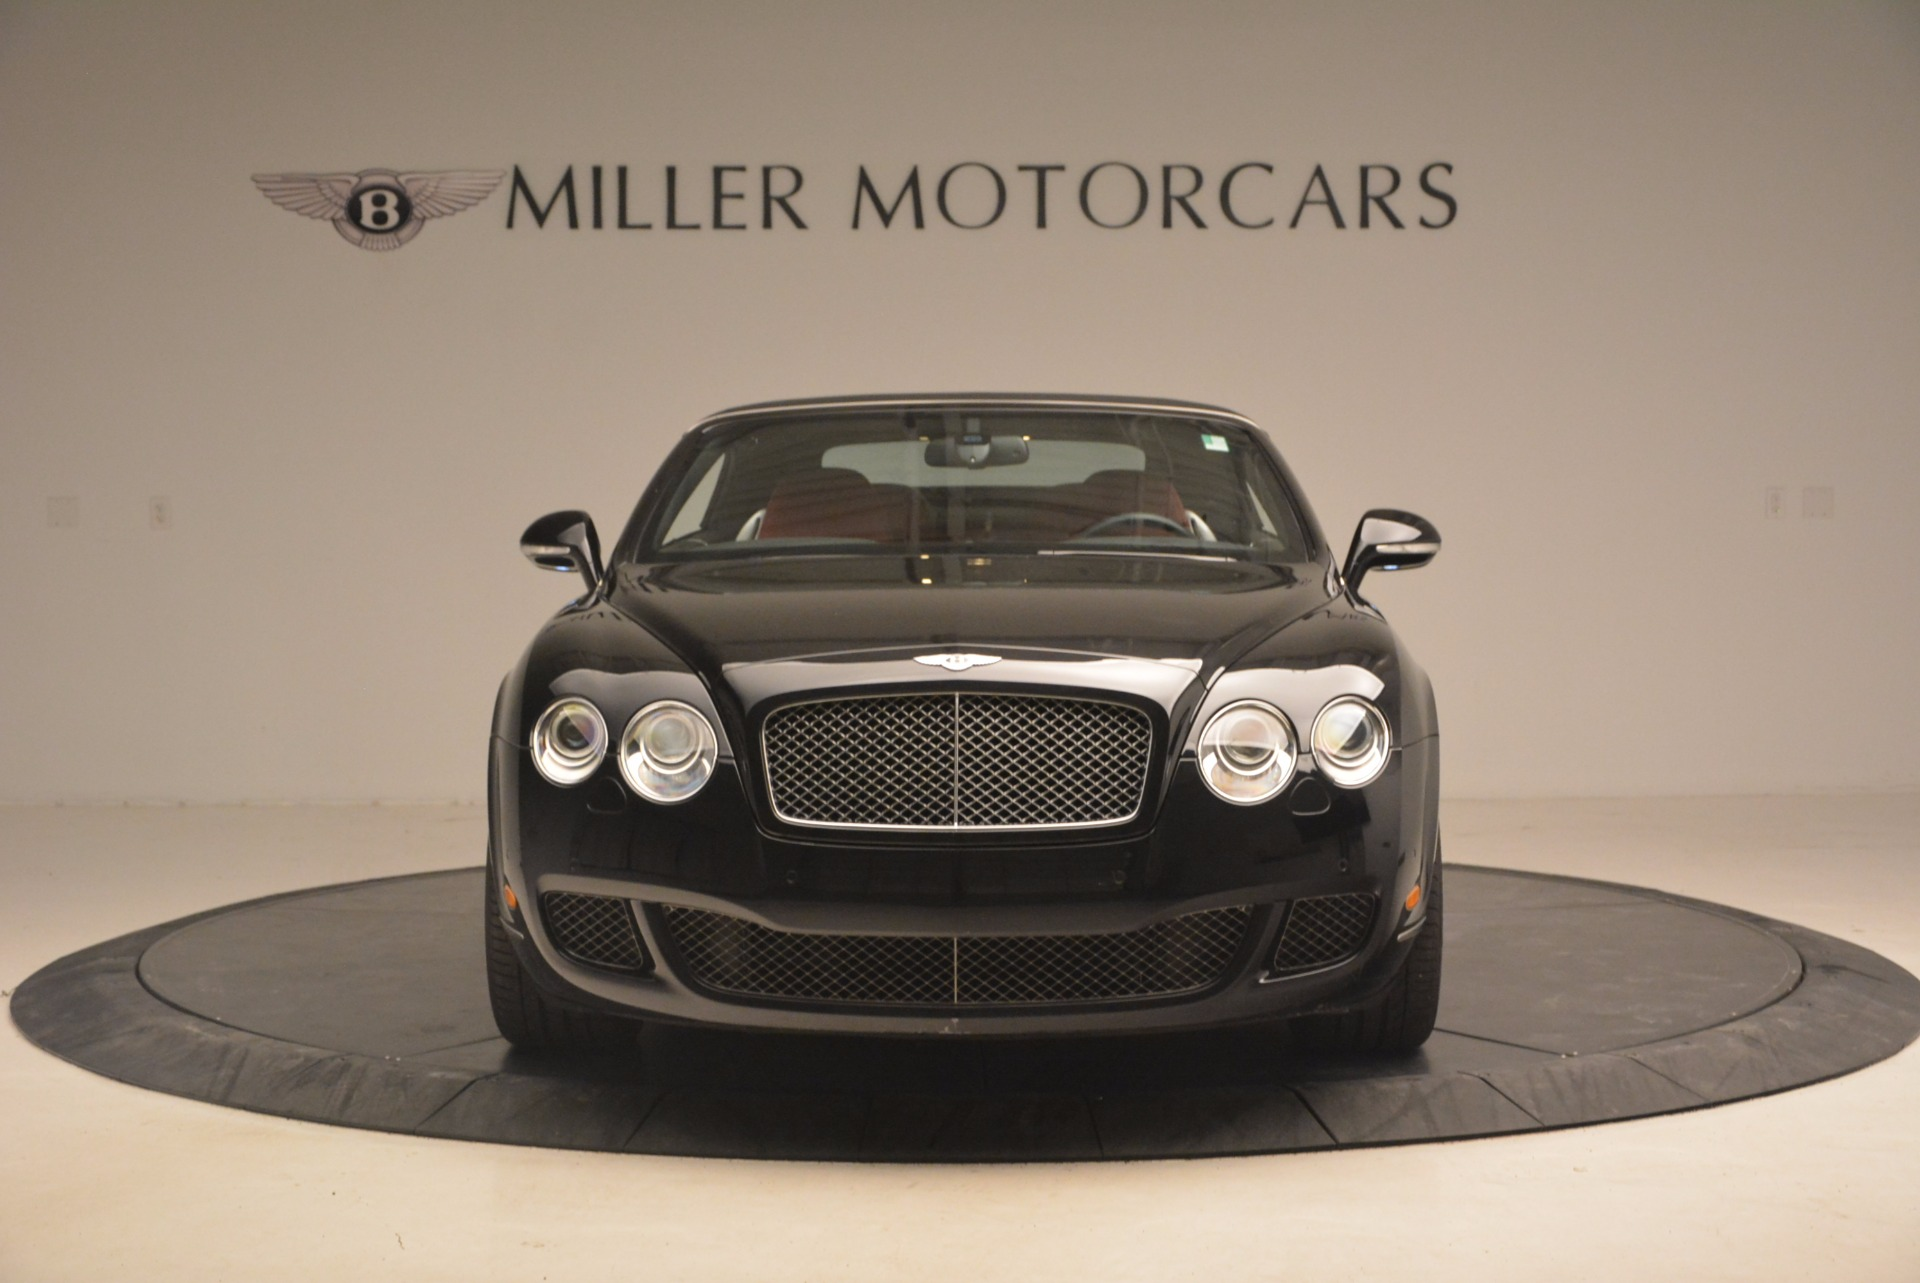 Used 2010 Bentley Continental GT Speed For Sale In Westport, CT 1298_p13